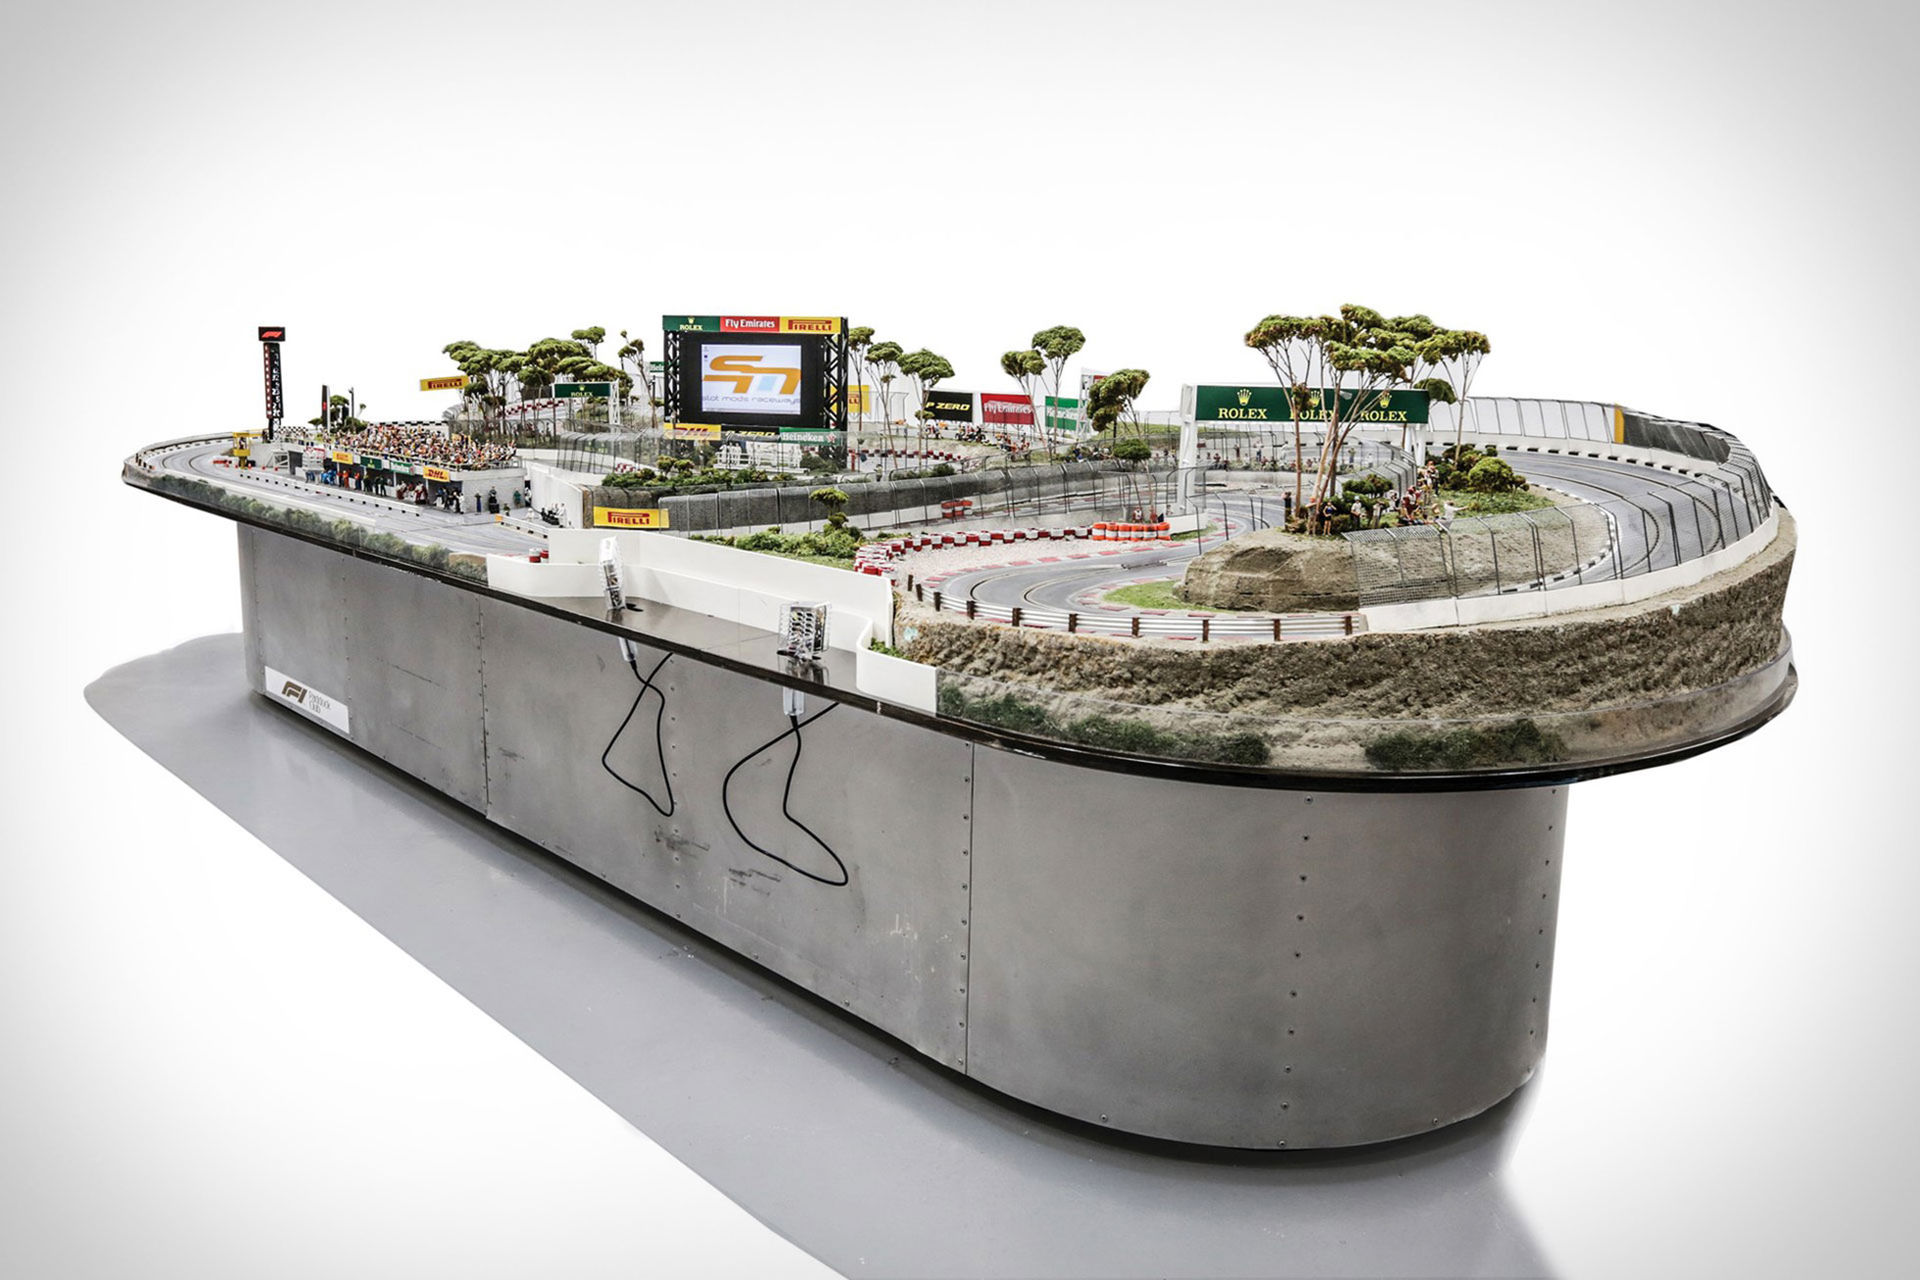 Fet Formel 1-bilbana i skala 1:23